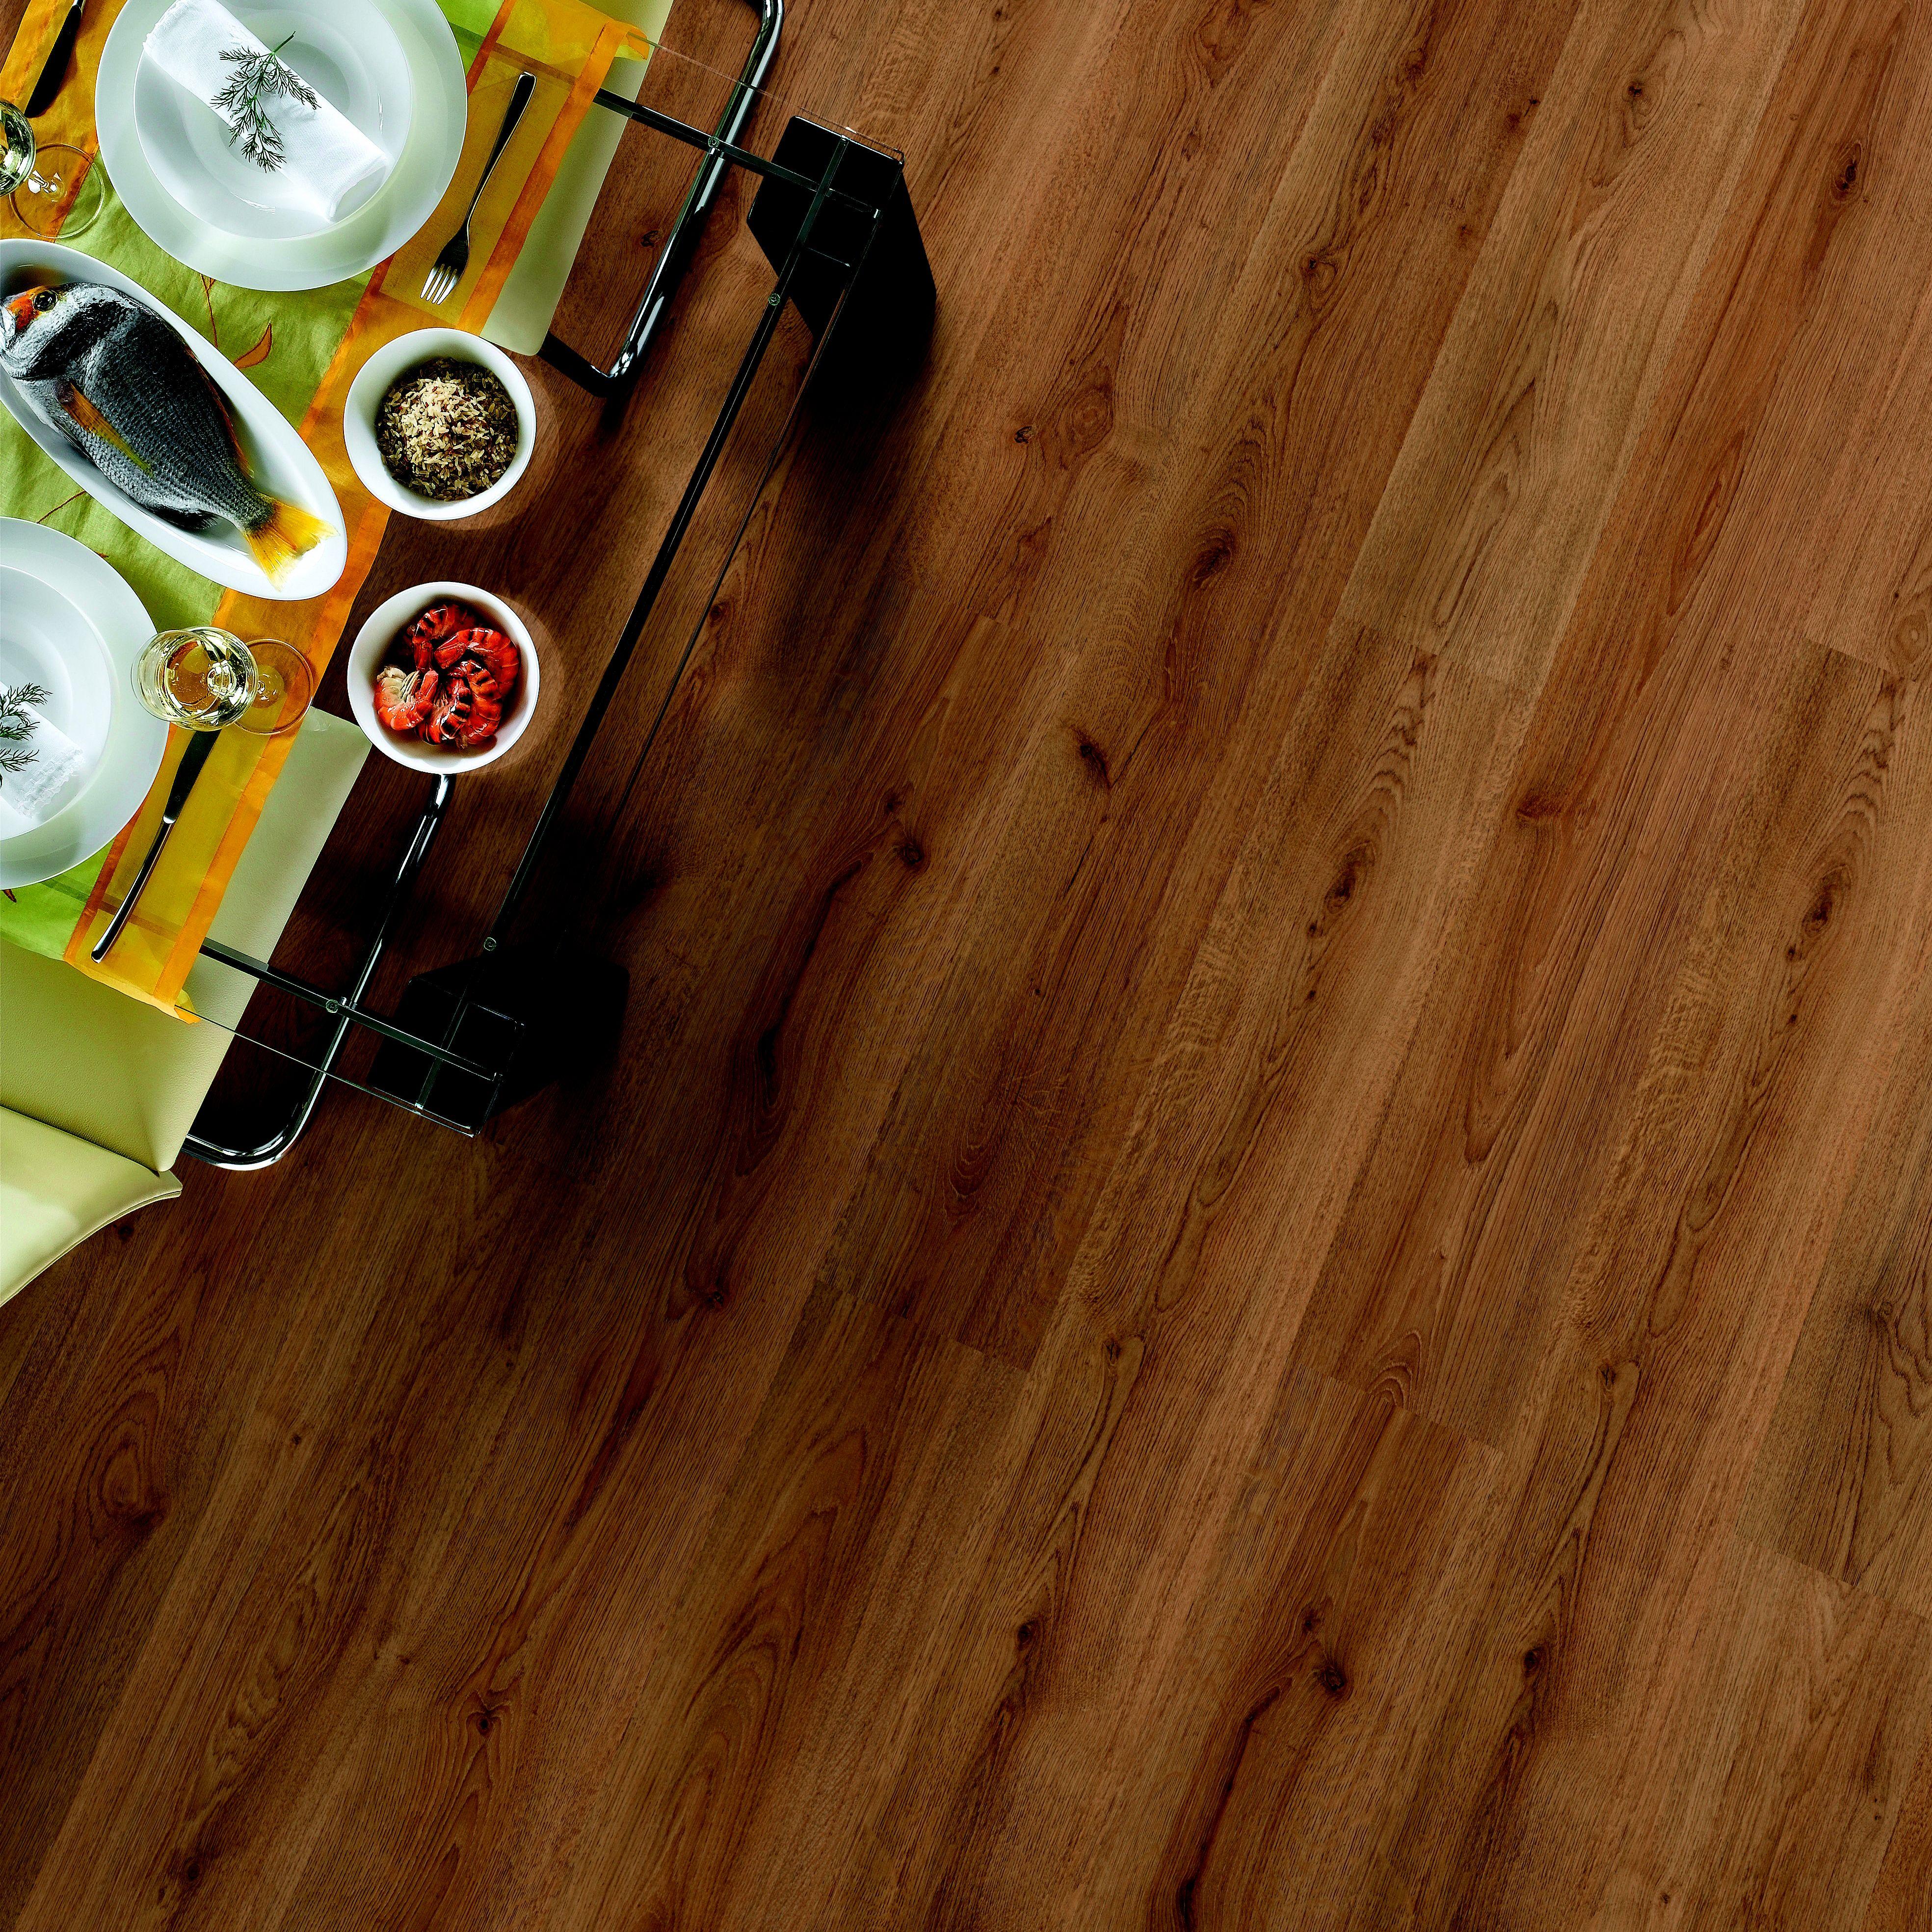 Bq Kitchen Laminate Flooring Oak Effect Laminate Flooring 292ma2 Pack Departments Diy At Bq